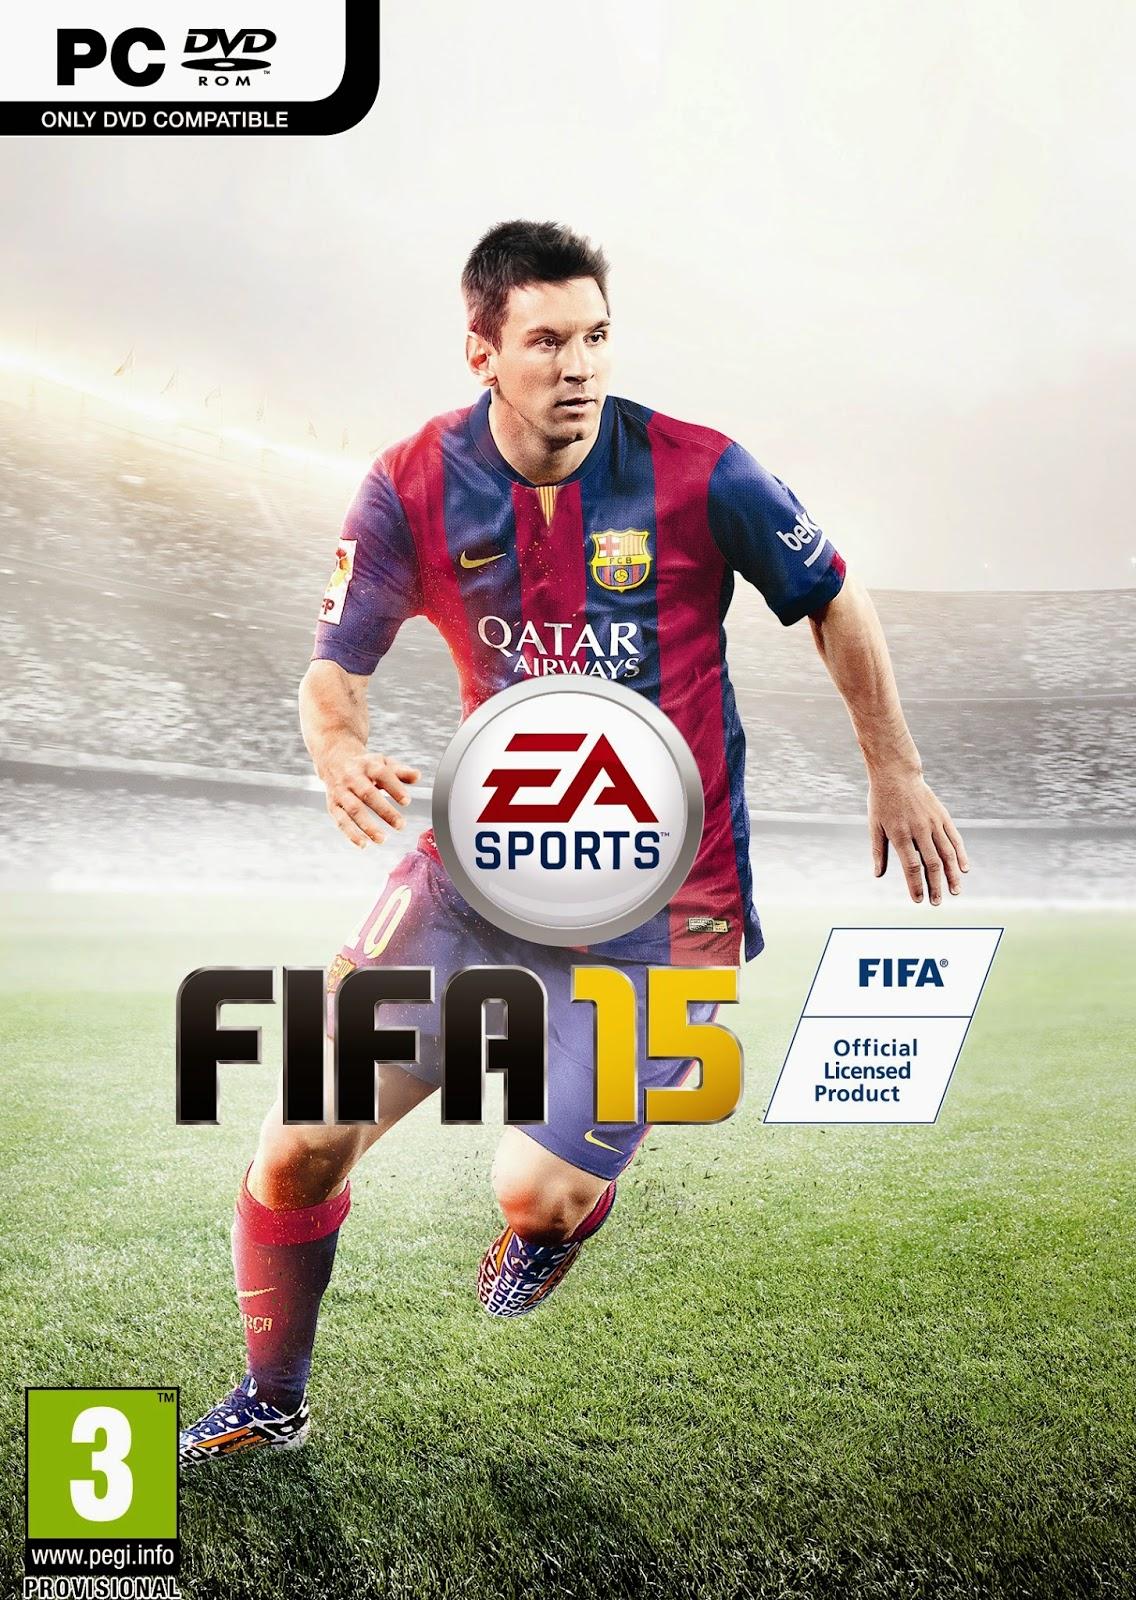 FIFA 15 ESPAÑOL LATINO y CASTELLANO PC Full